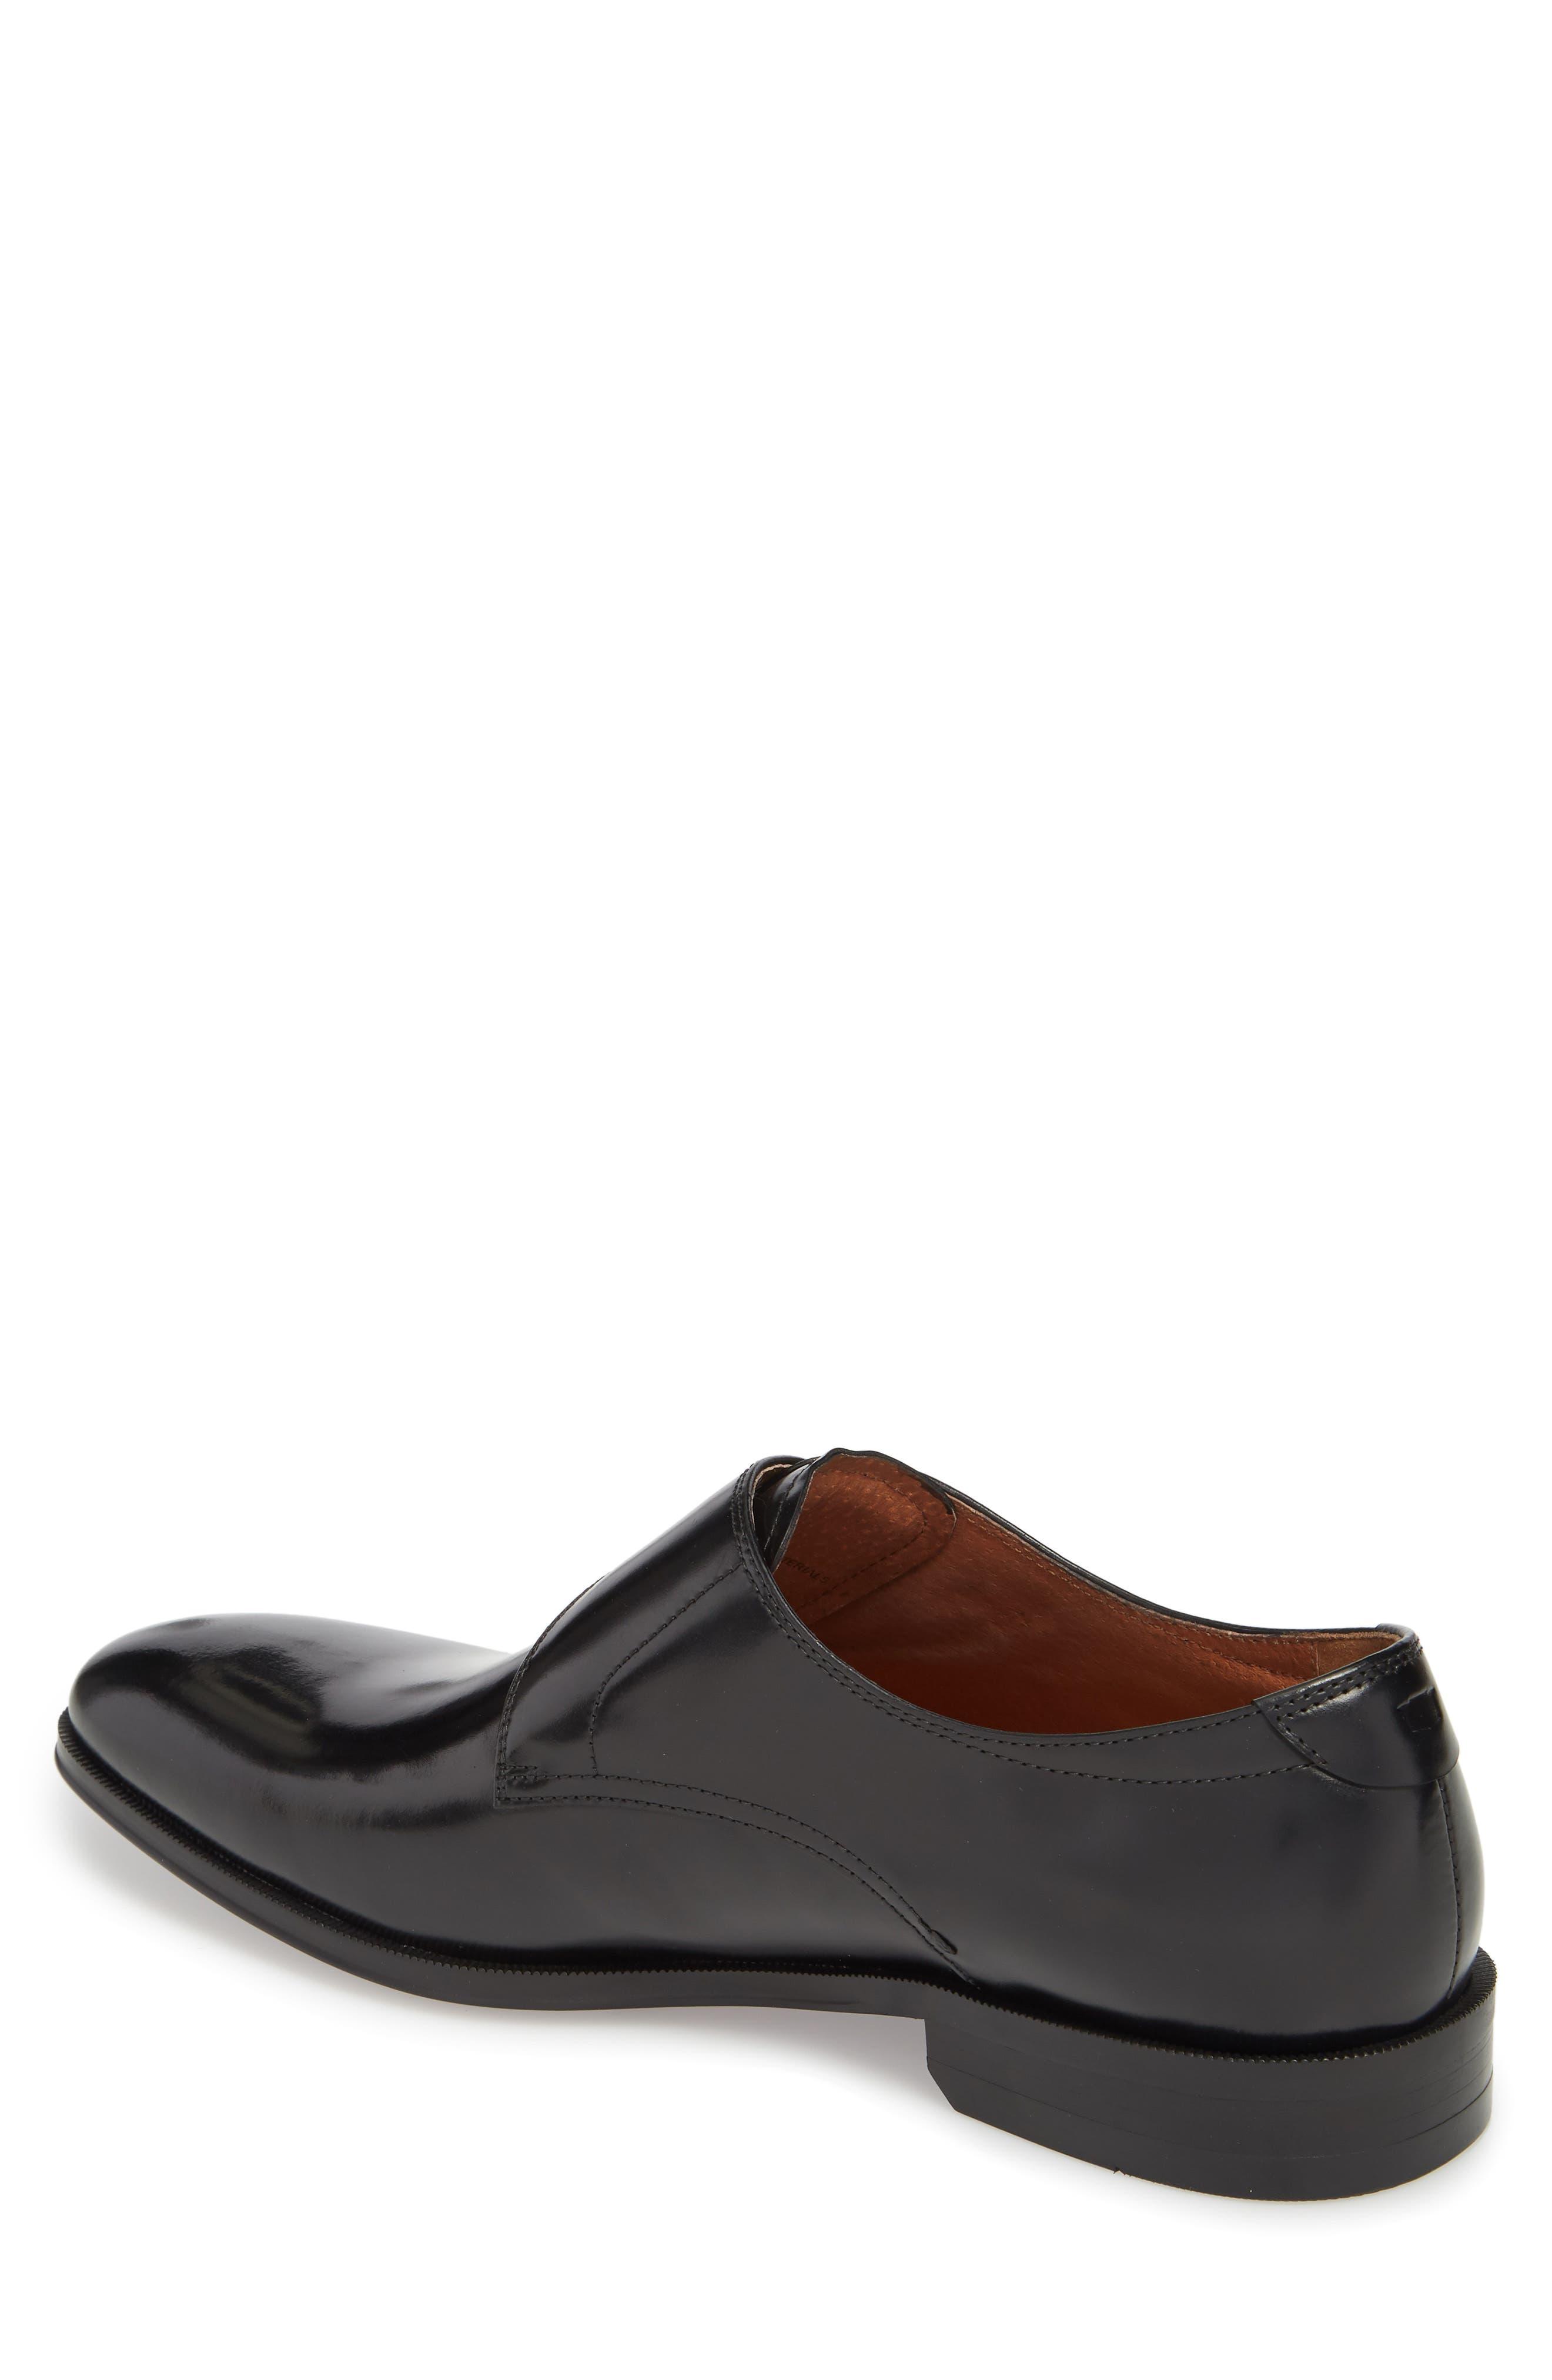 FLORSHEIM, Belfast Single Strap Monk Shoe, Alternate thumbnail 2, color, BLACK LEATHER